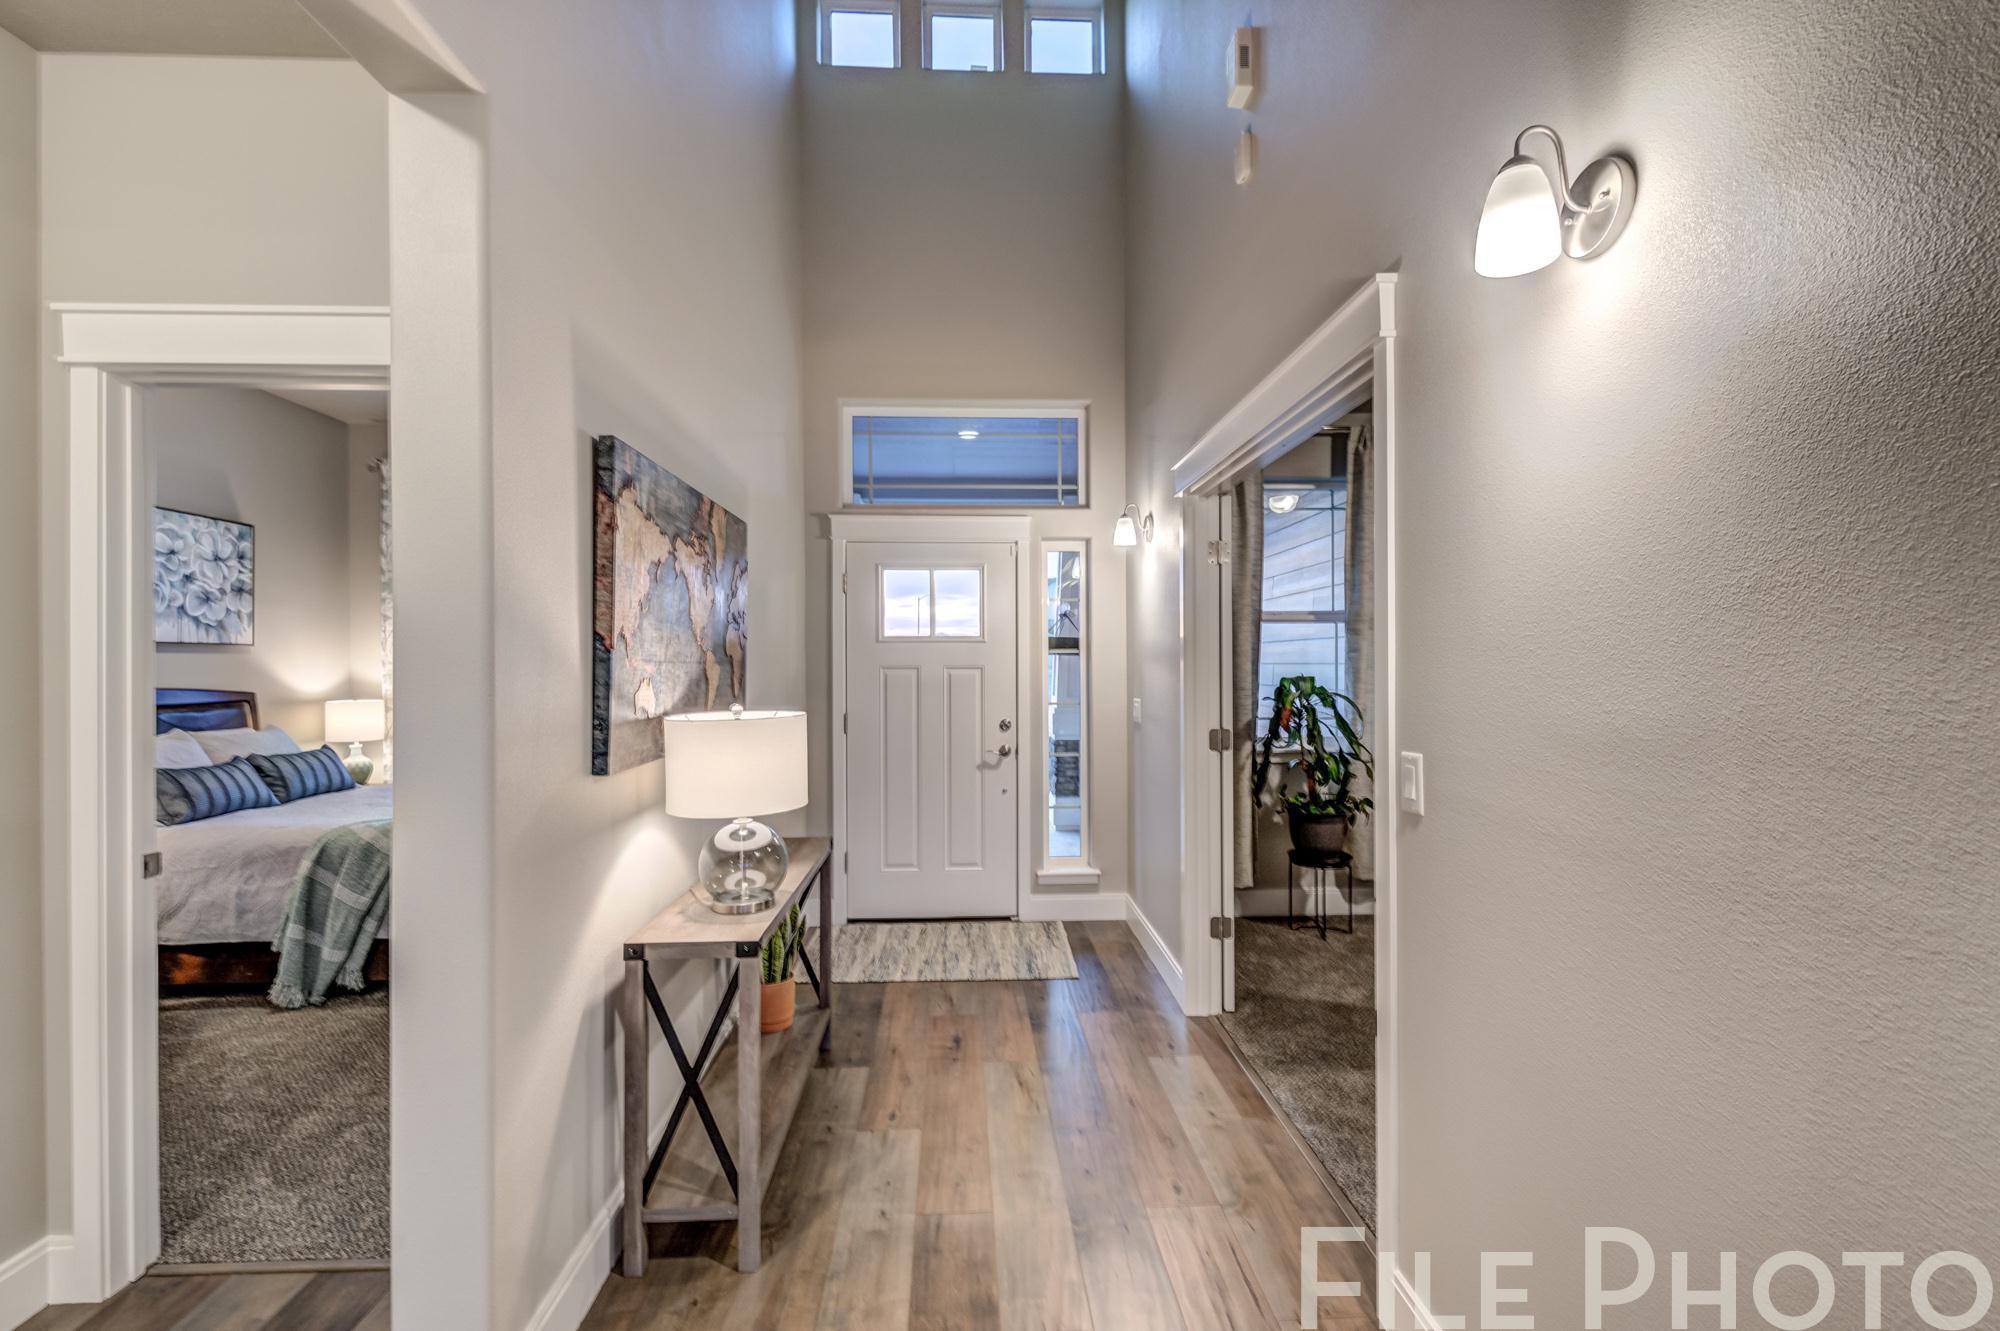 Living Area featured in The Homestead Bonus By RYN Built Homes in Spokane-Couer d Alene, WA